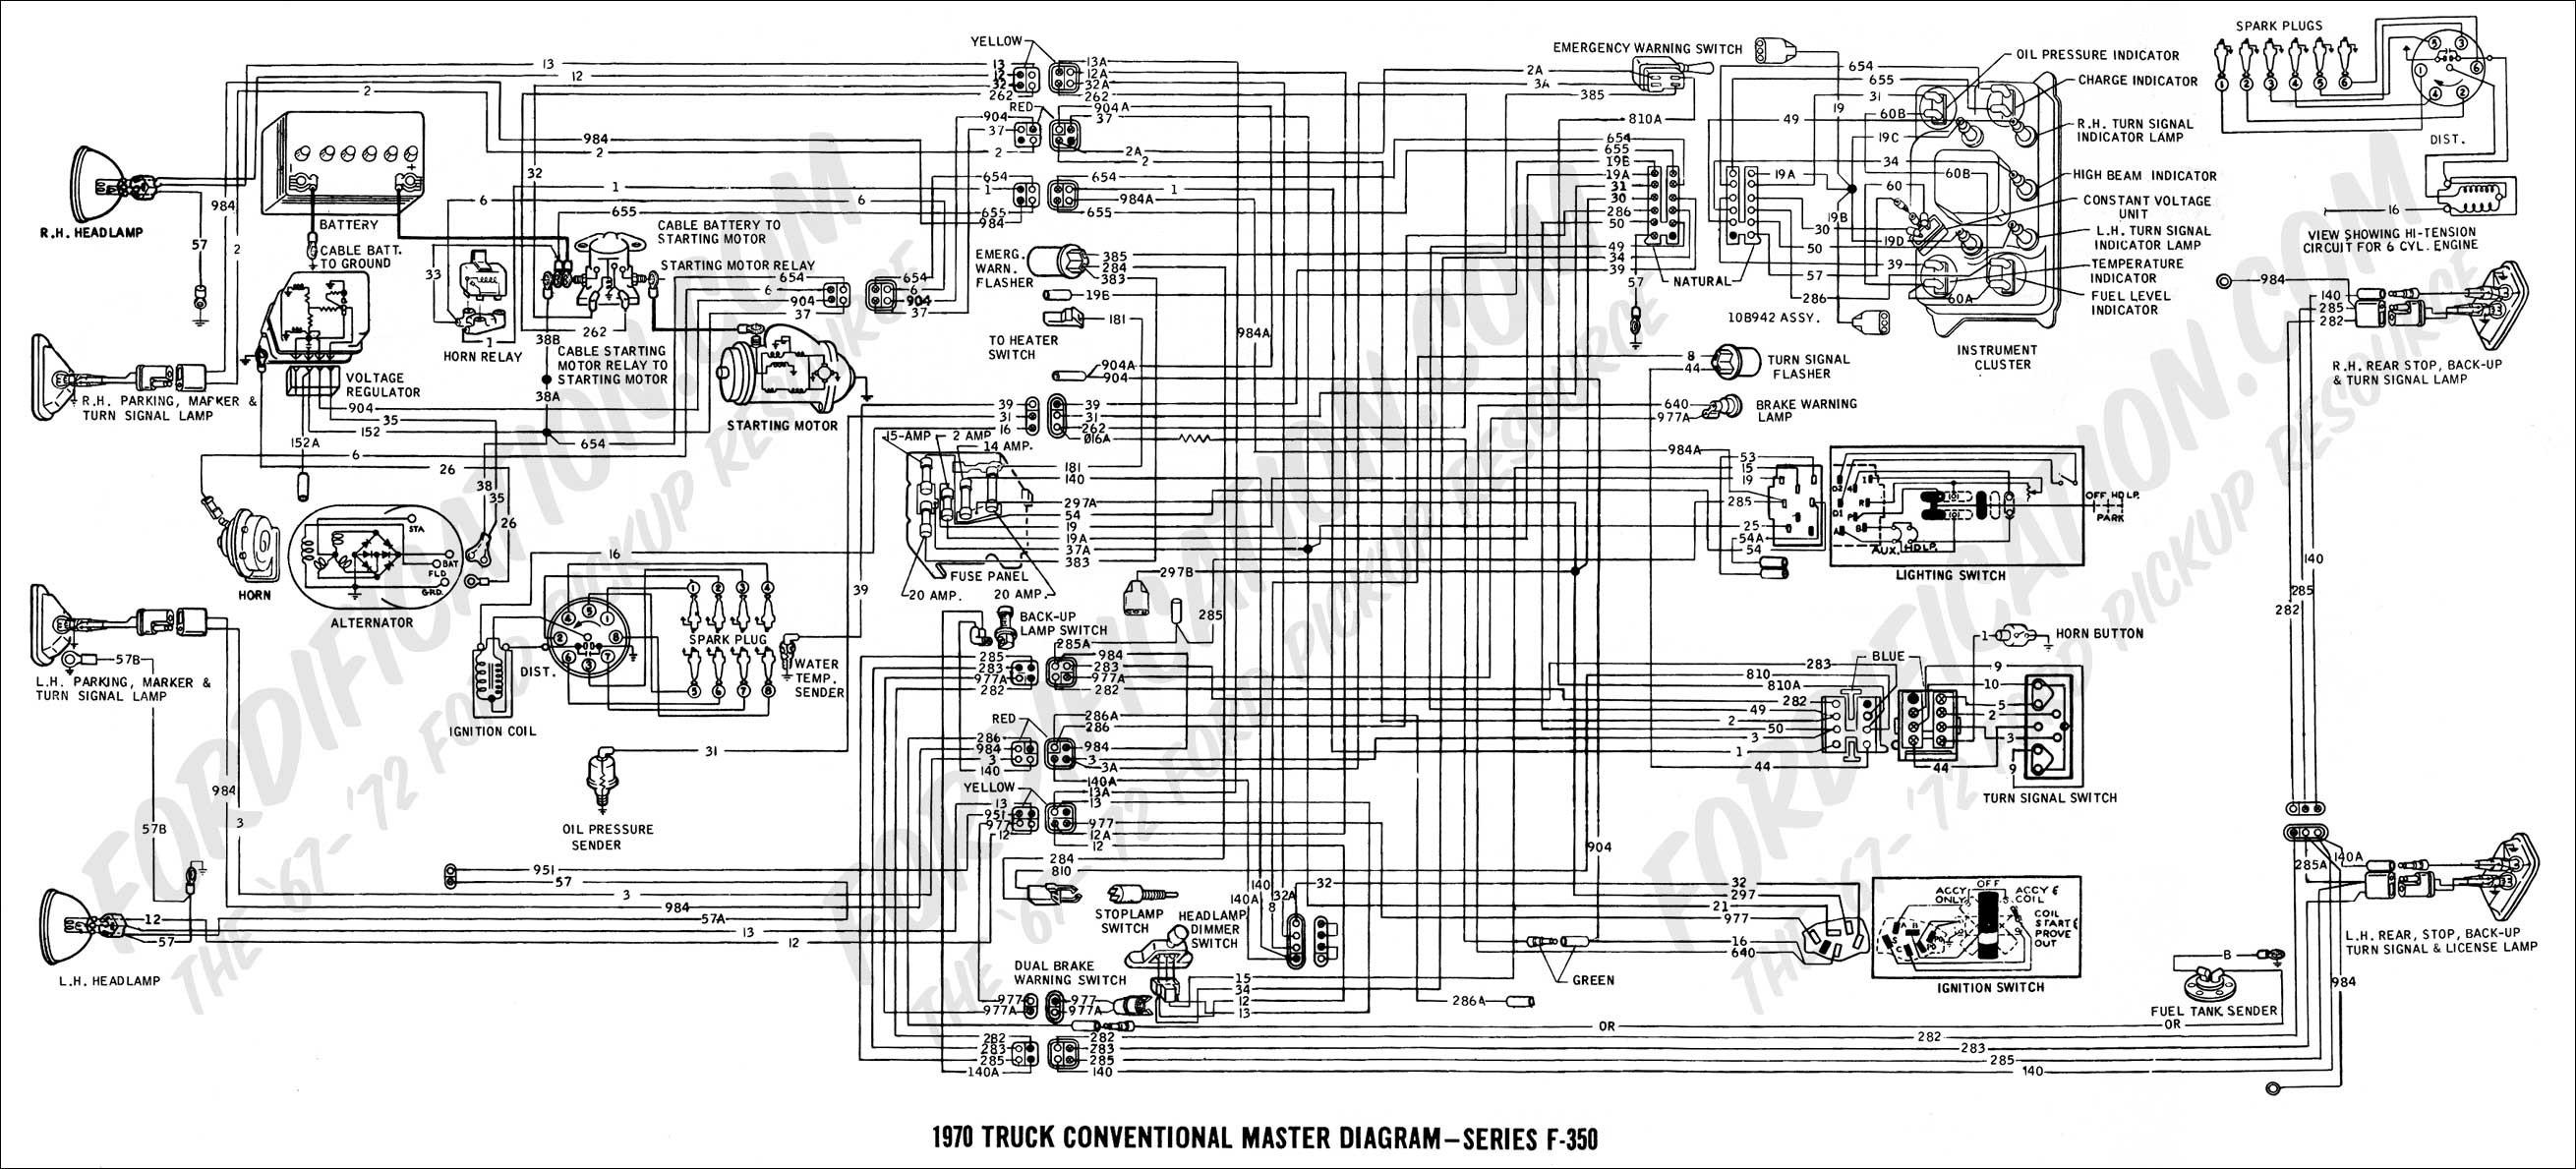 84 Chevy Truck Wiring Diagram 1